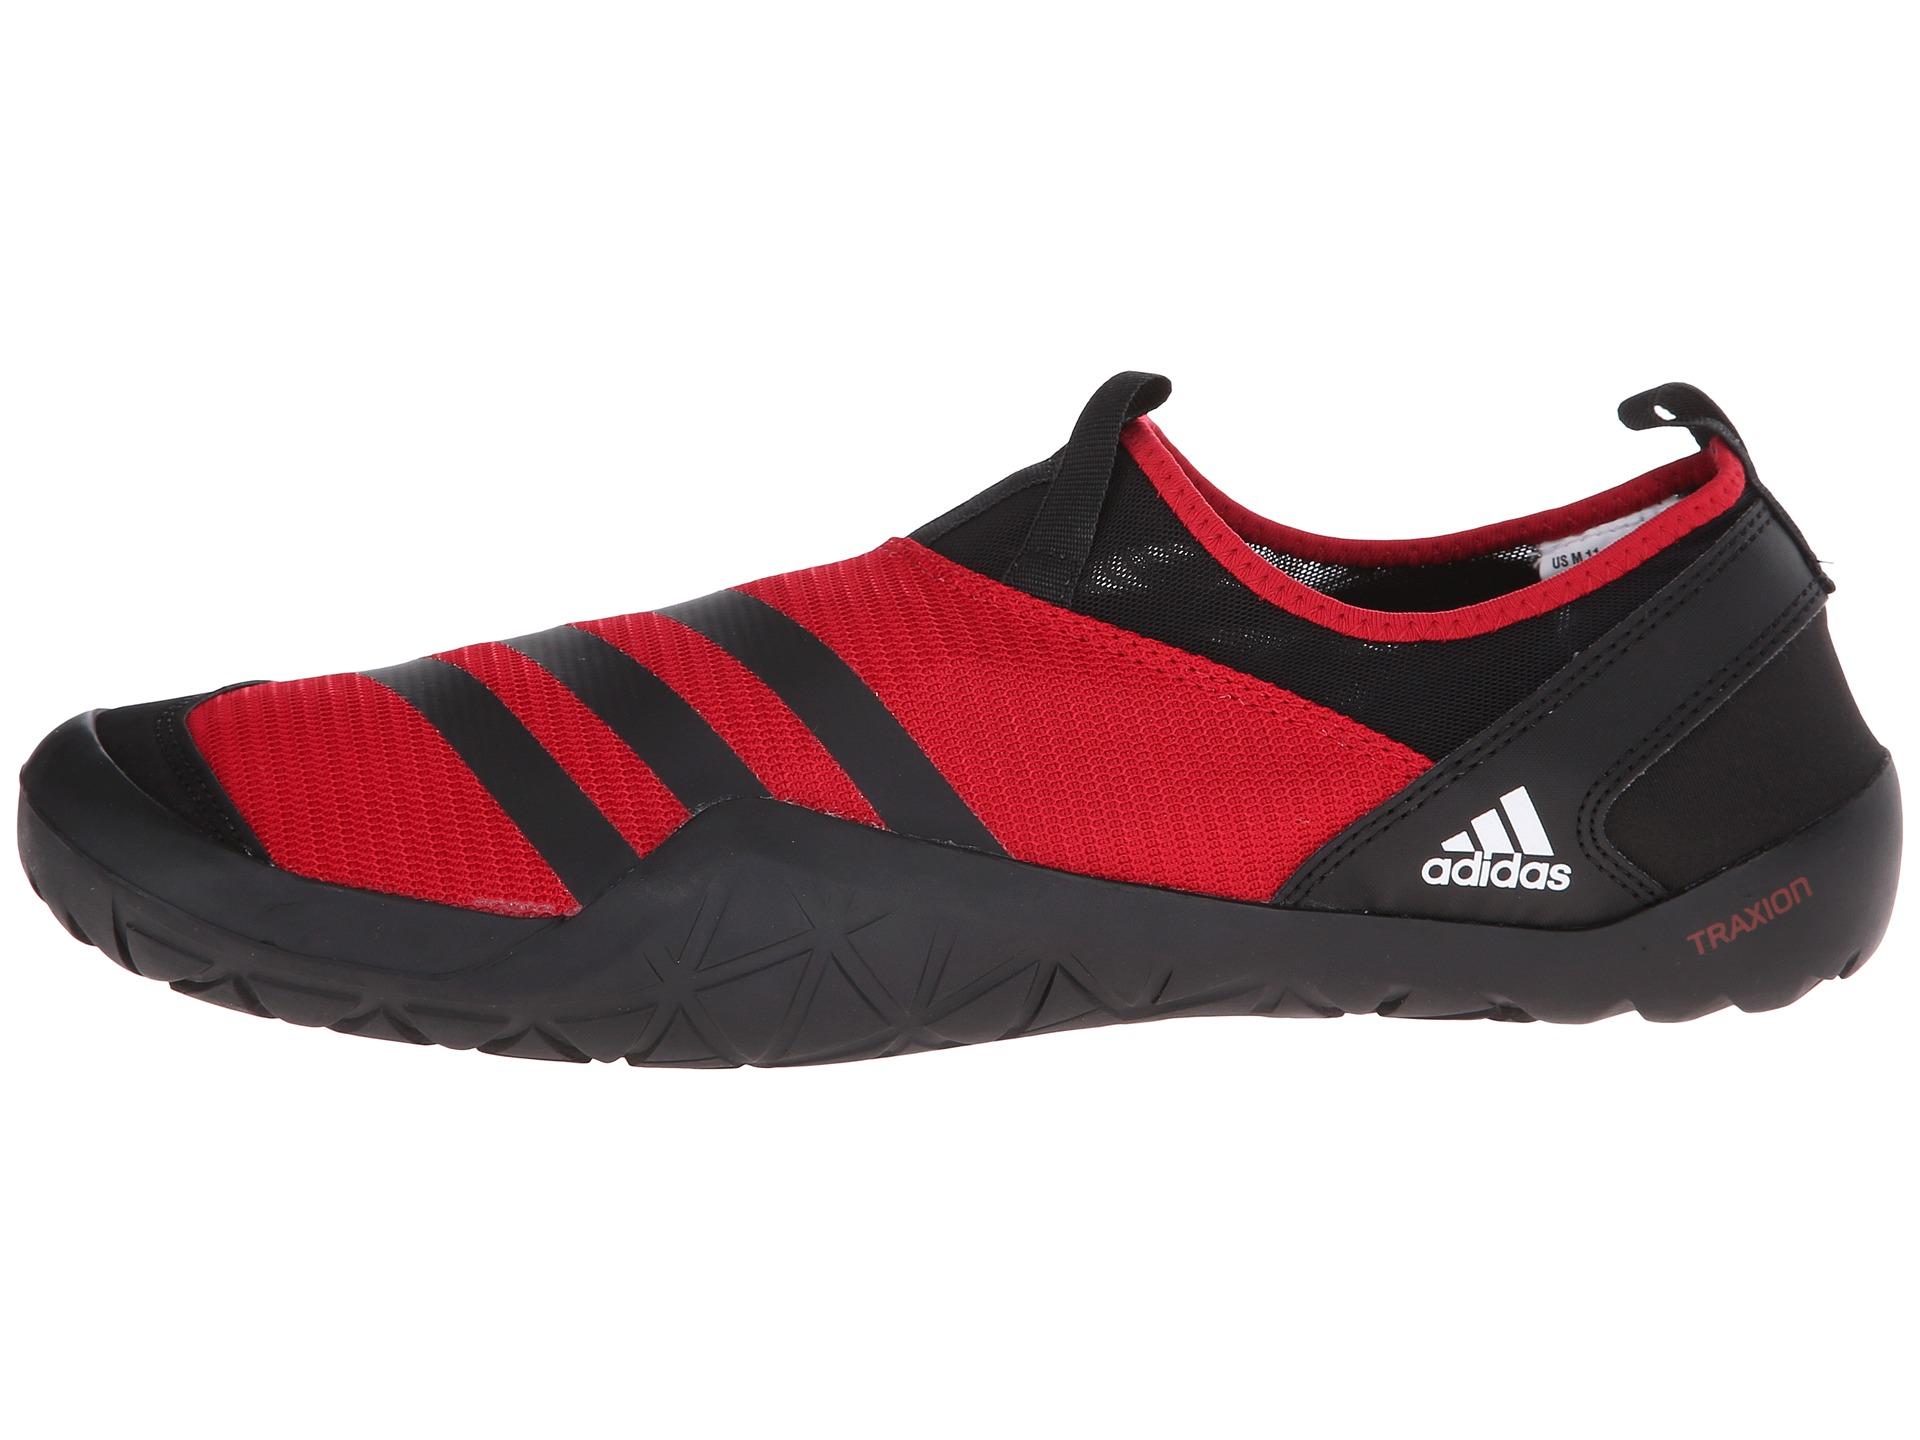 Lyst - adidas Originals Climacool® Jawpaw Slip-on in Red for Men b04ebeec385b